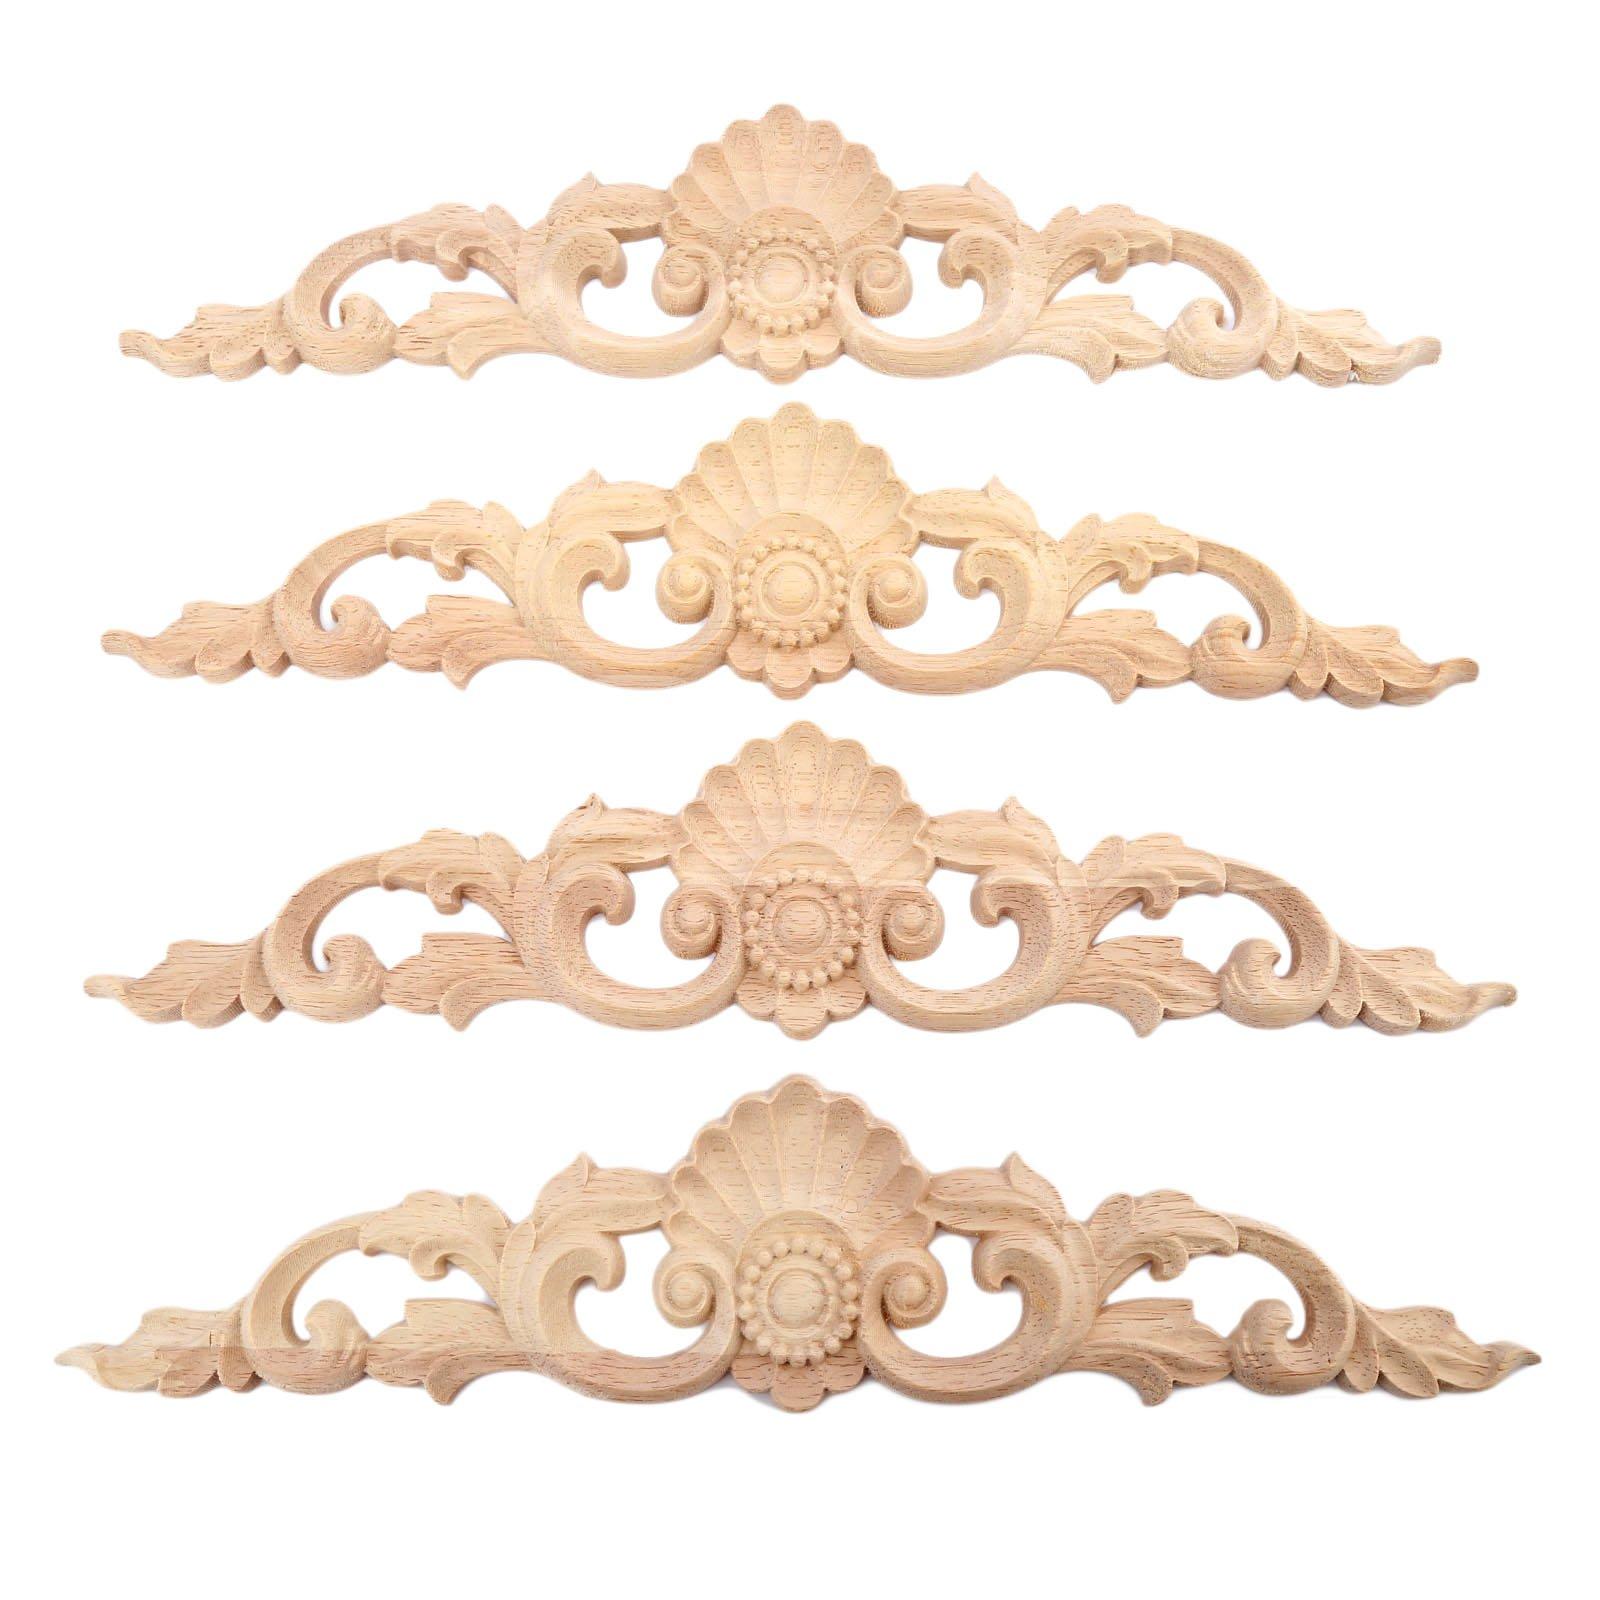 4pcs 30x6.5cm Wood Carved Long Onlay Applique Unpainted Furniture Door European Style